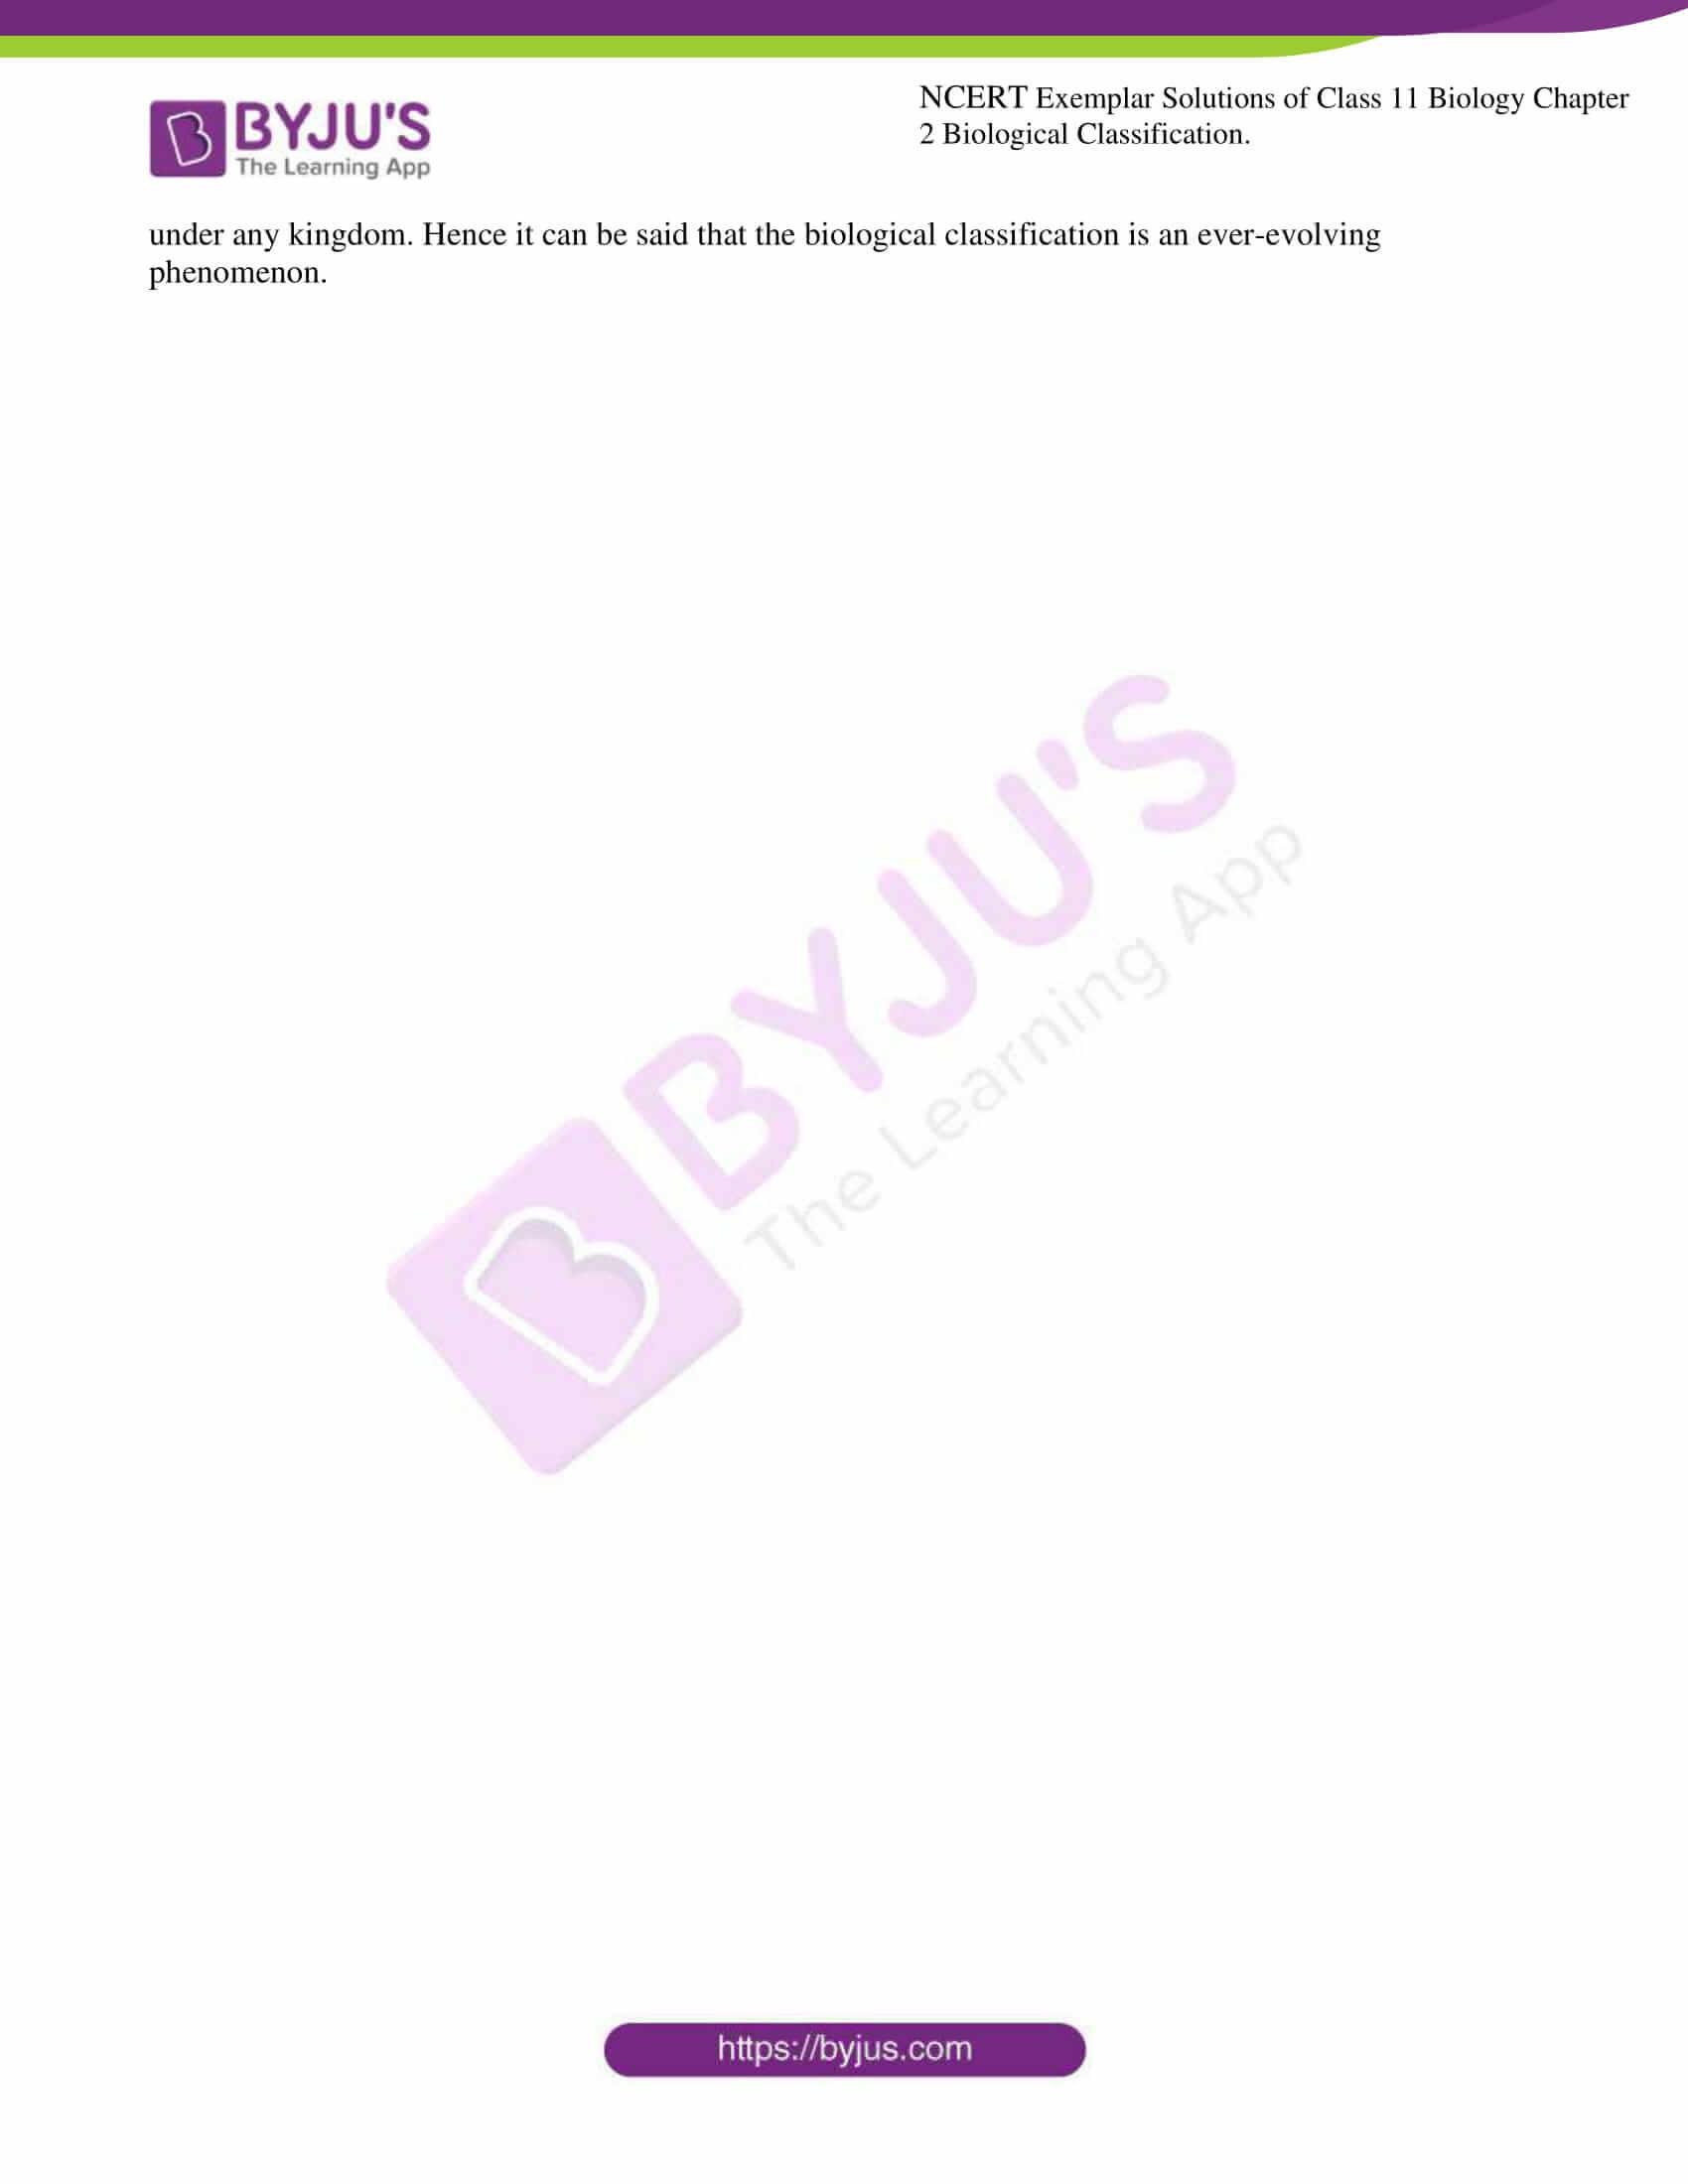 ncert exemplar solutions for class 11 bio chapter 2 7